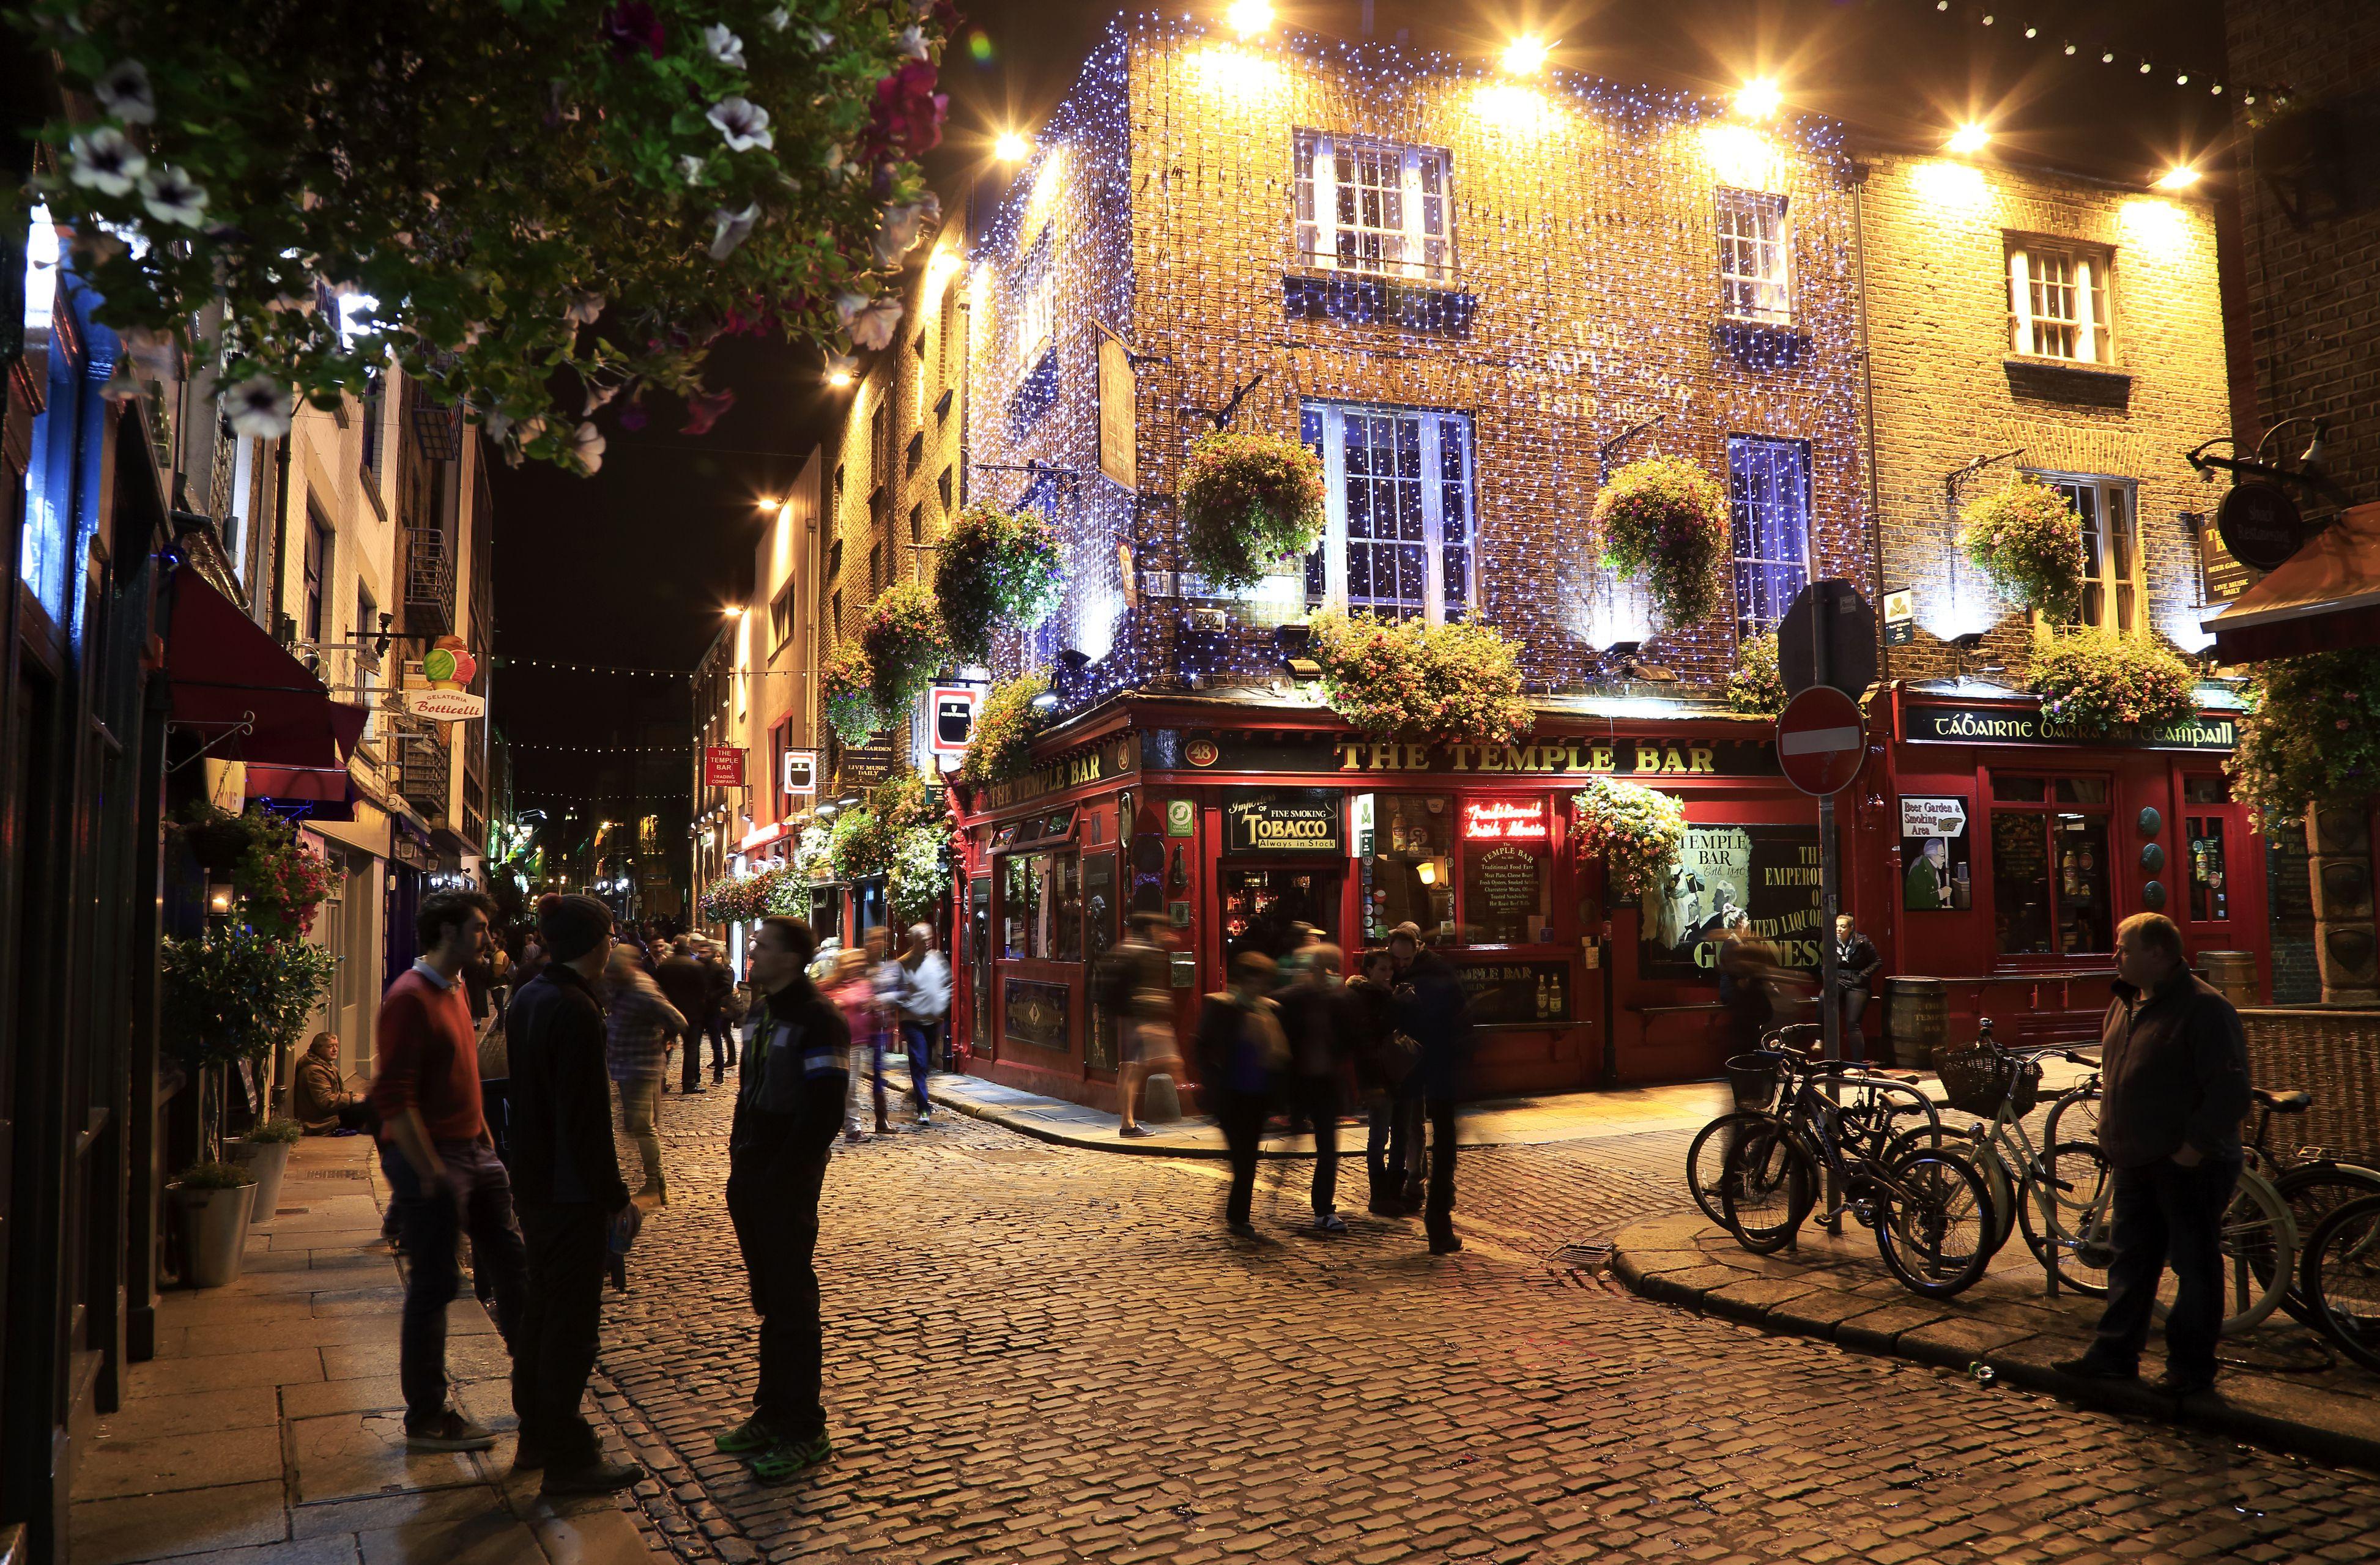 Night view of historic Temple Bar pub